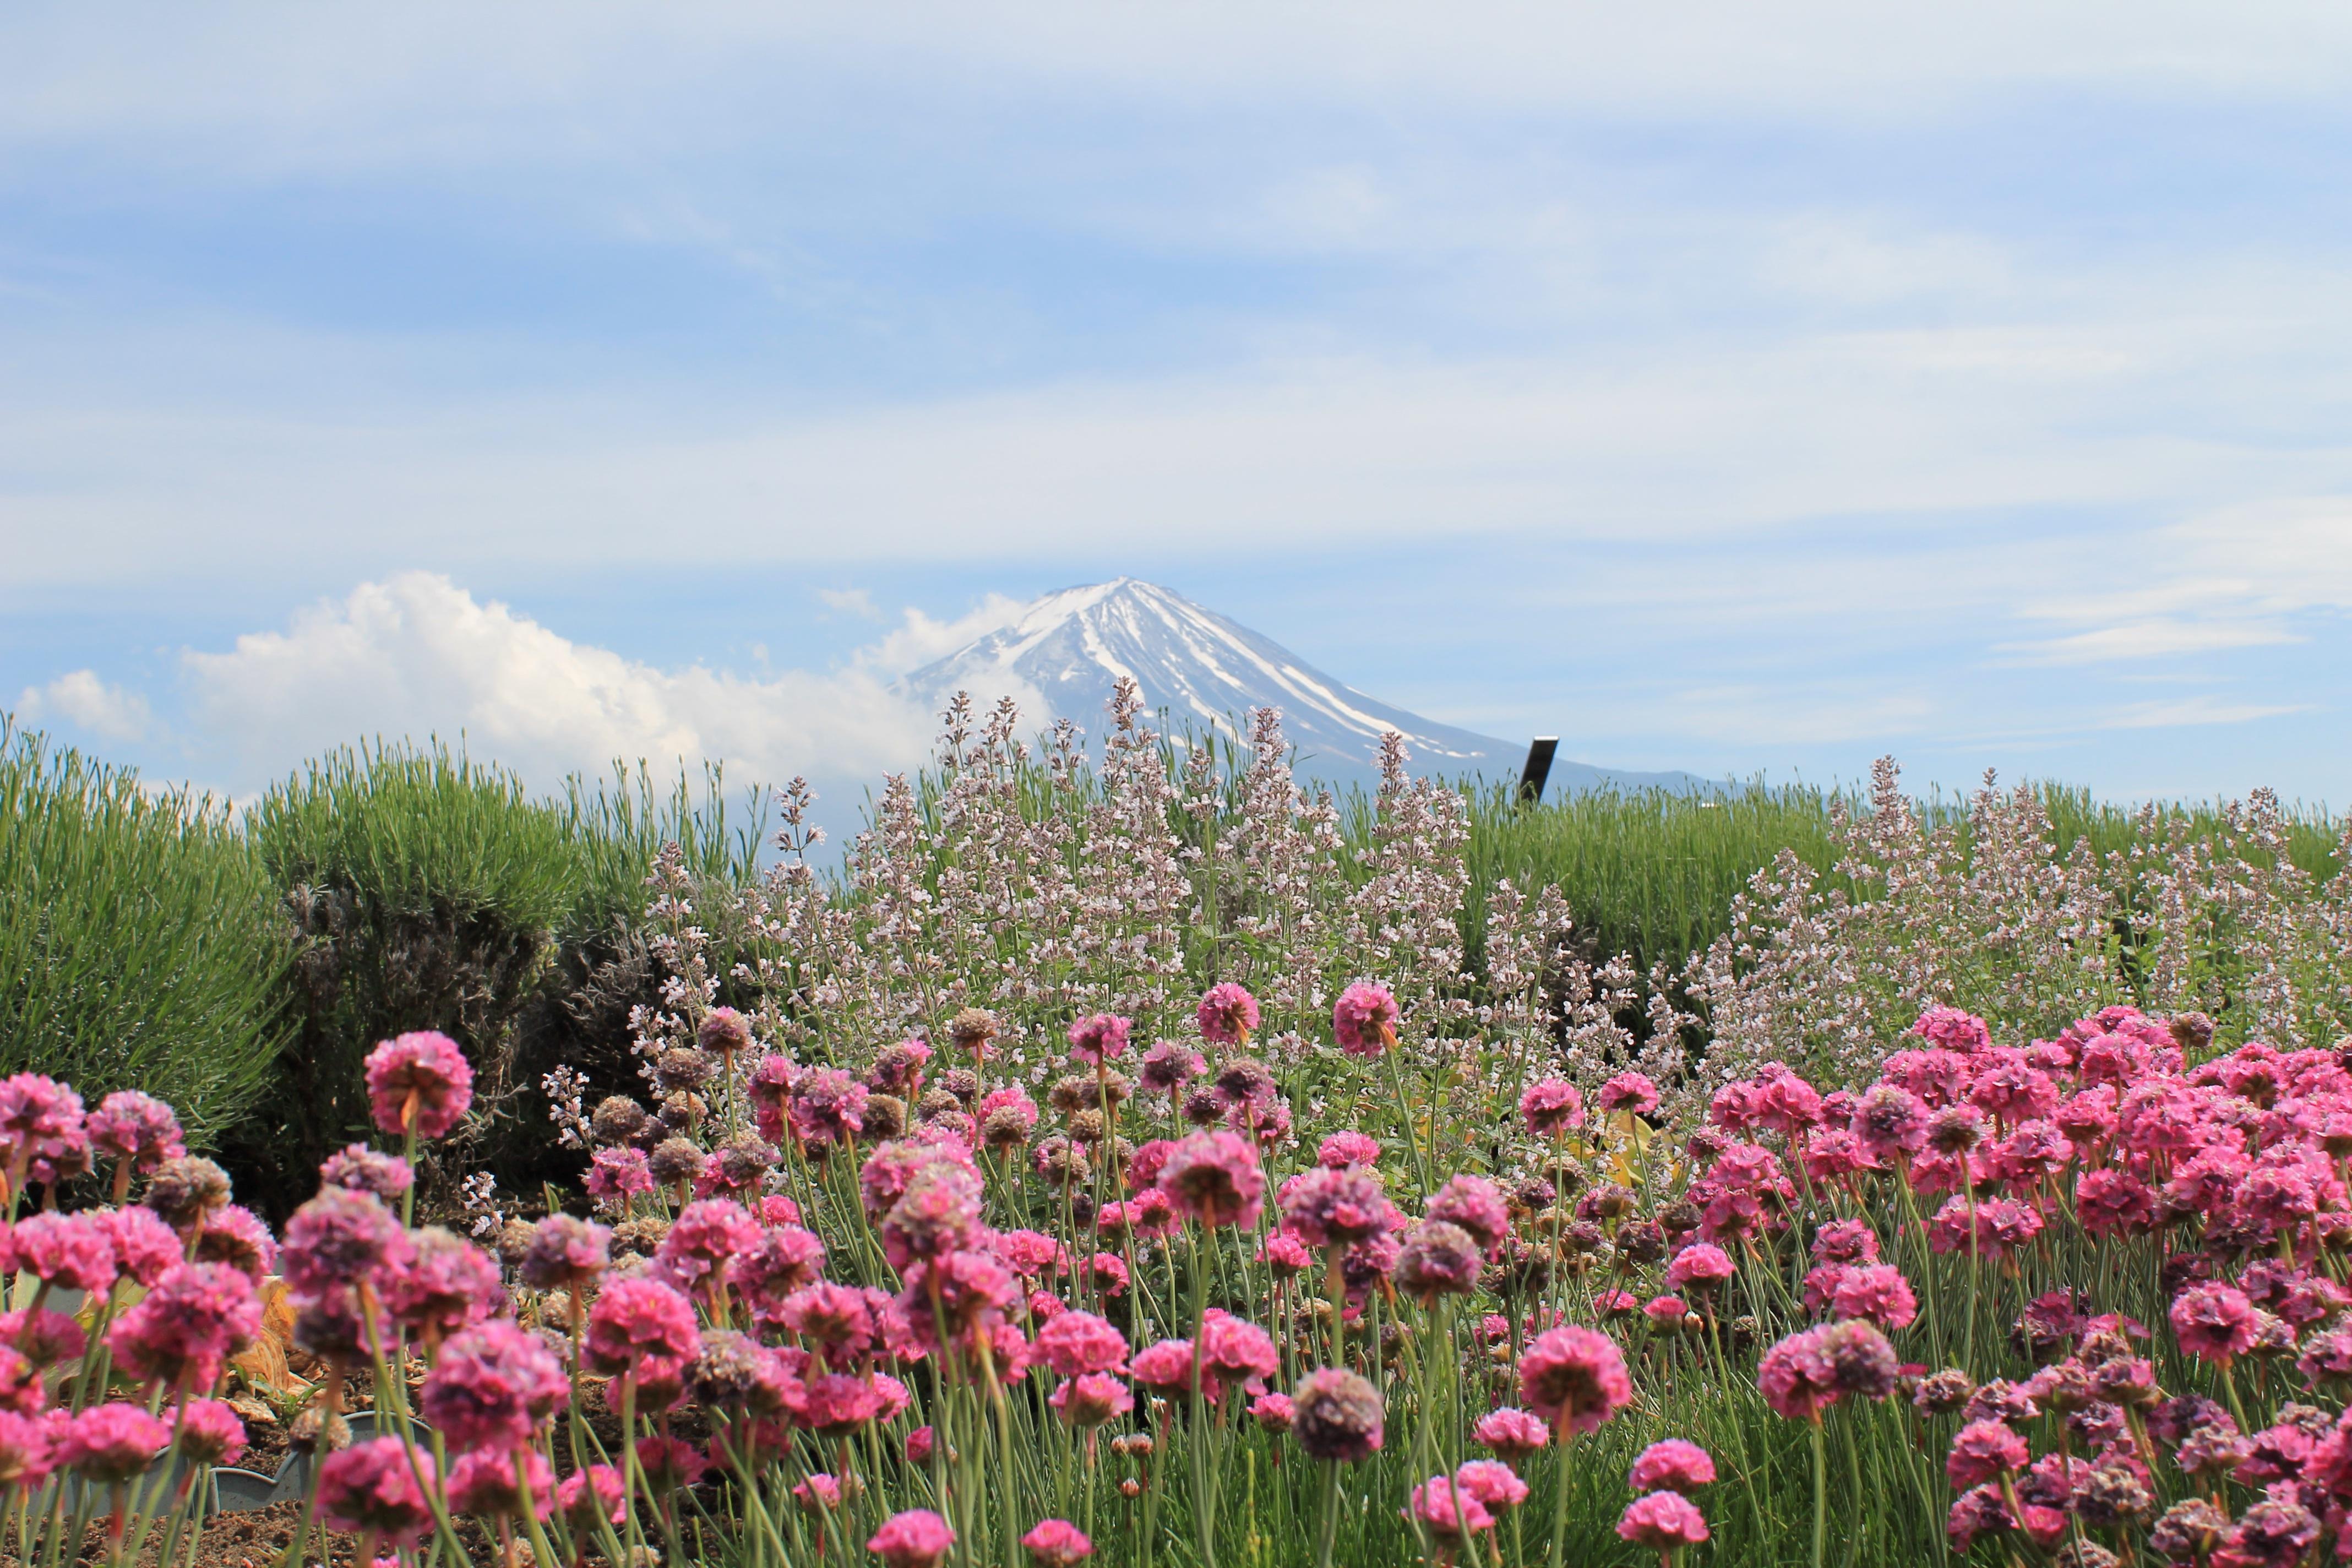 Free Images : nature, grass, blossom, mountain, sky, field, farm, meadow, prairie, flower, park, asia, japan, flora, wildflower, mount fuji, wild flowers, ...